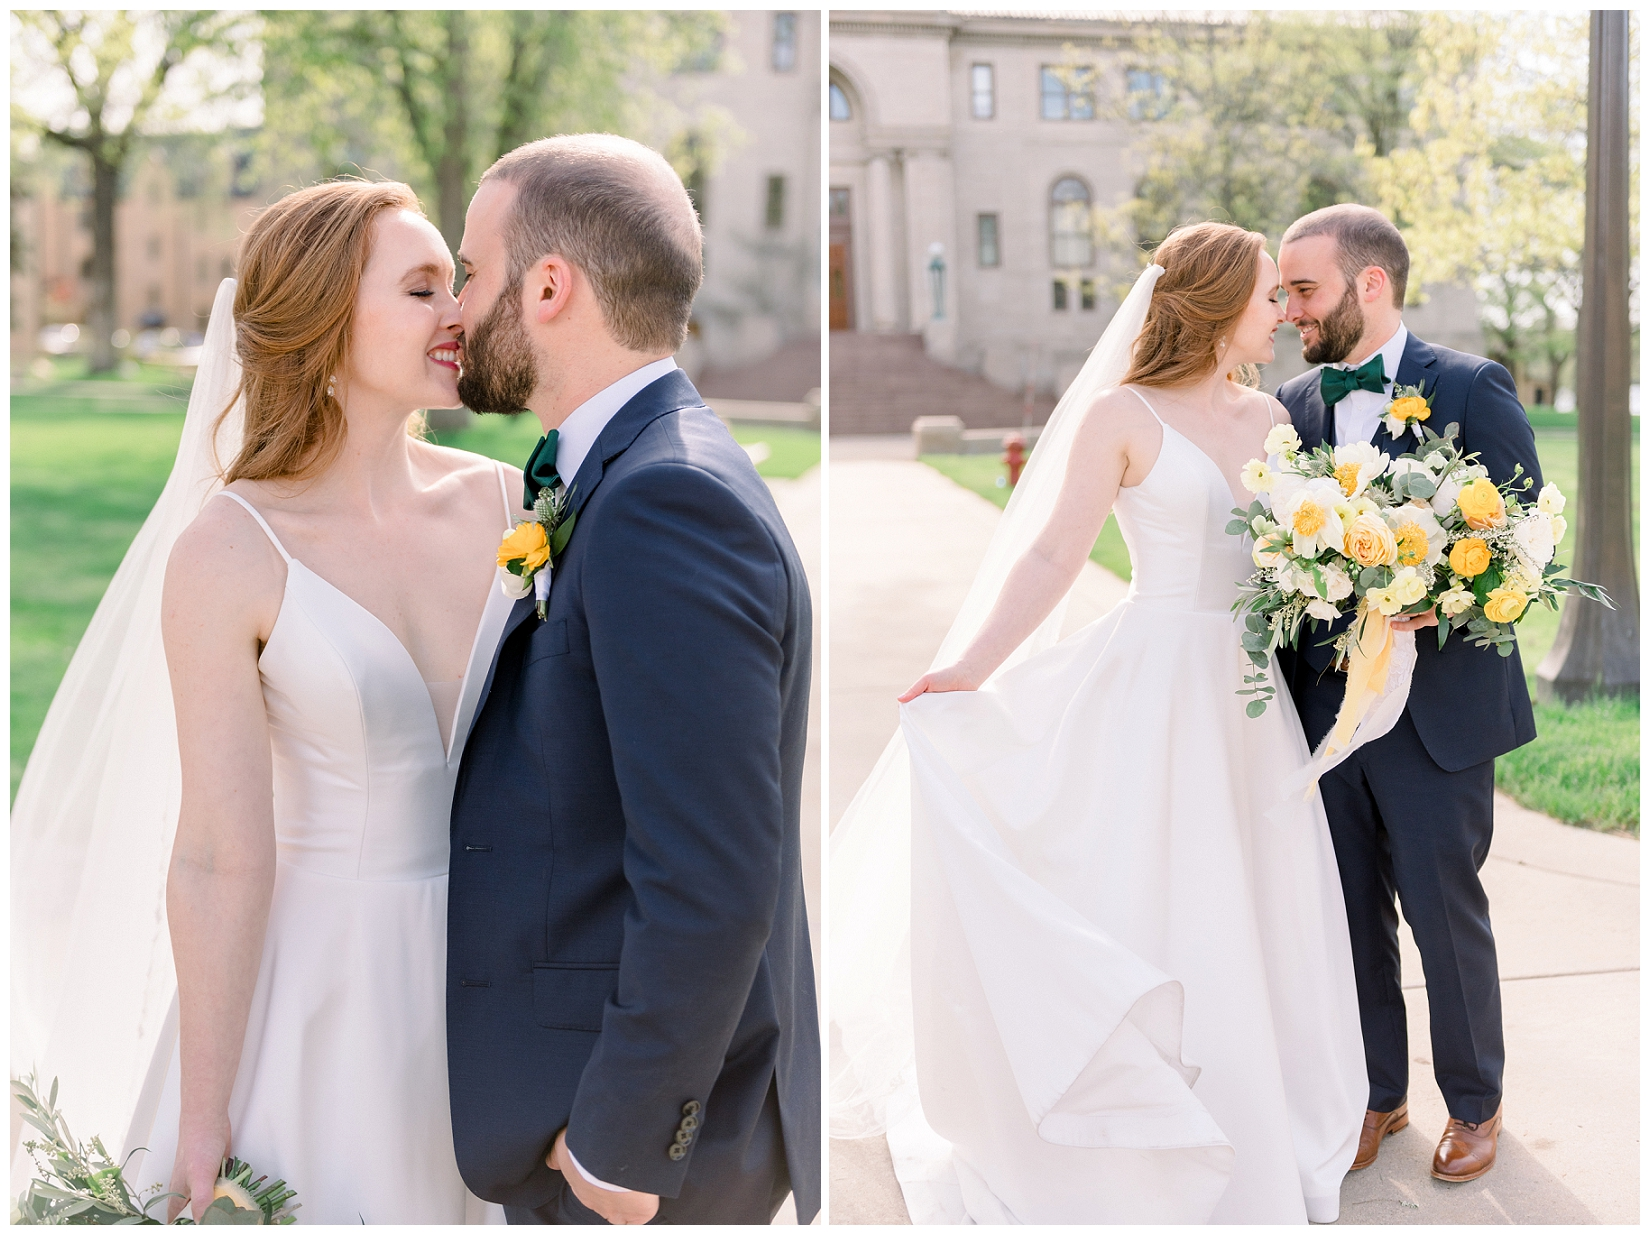 cat-alkire-wedding-photographer-indiana-chicago-indianapolis-fort-wayne_1218.jpg